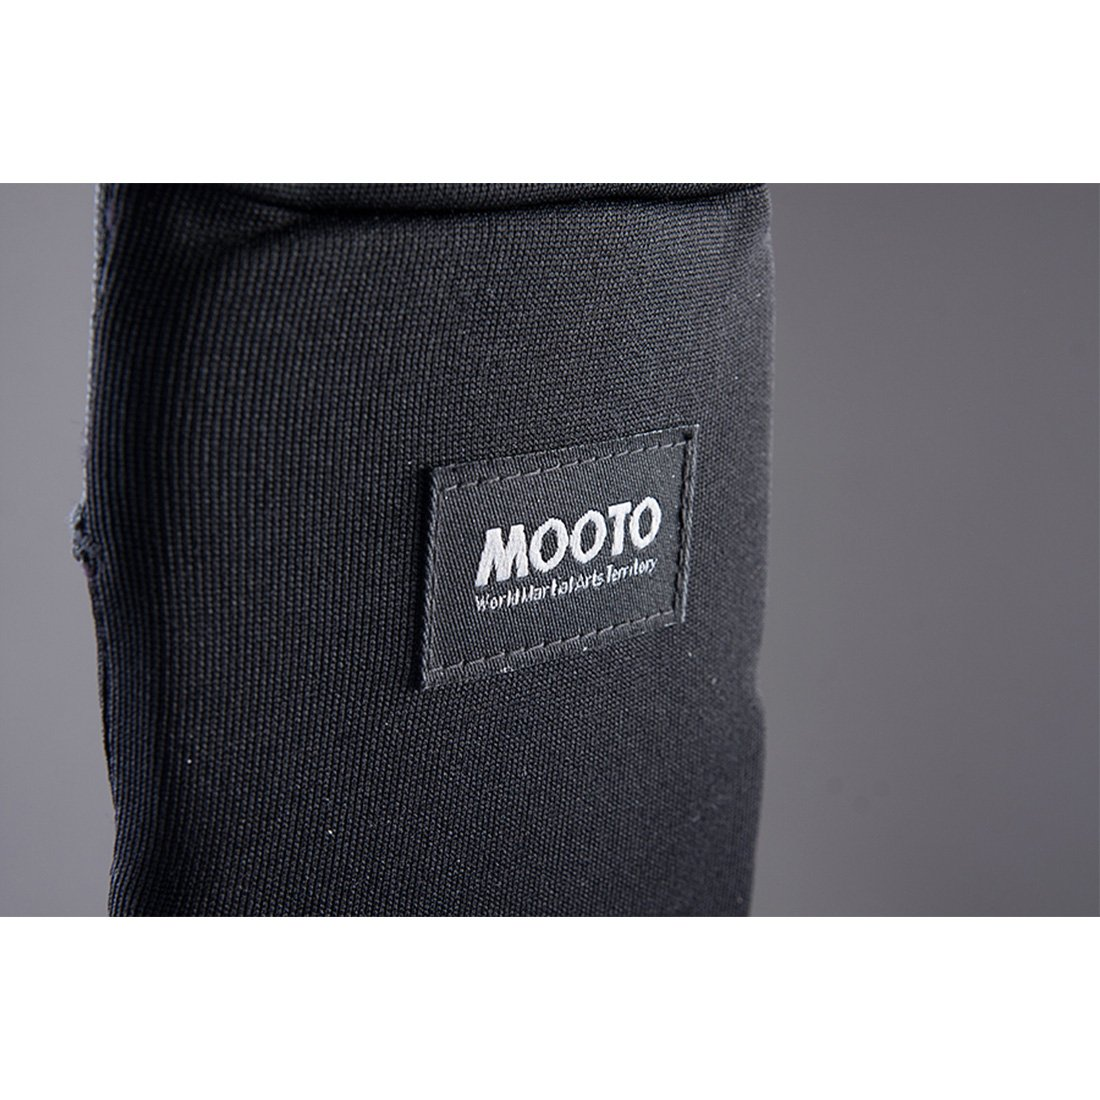 Mooto Korea Taekwondo Instep Cotton Guard Protector Black A Pair MMA Martial Arts Kickboxing Kareate Hapkido Jujitsu Kicking